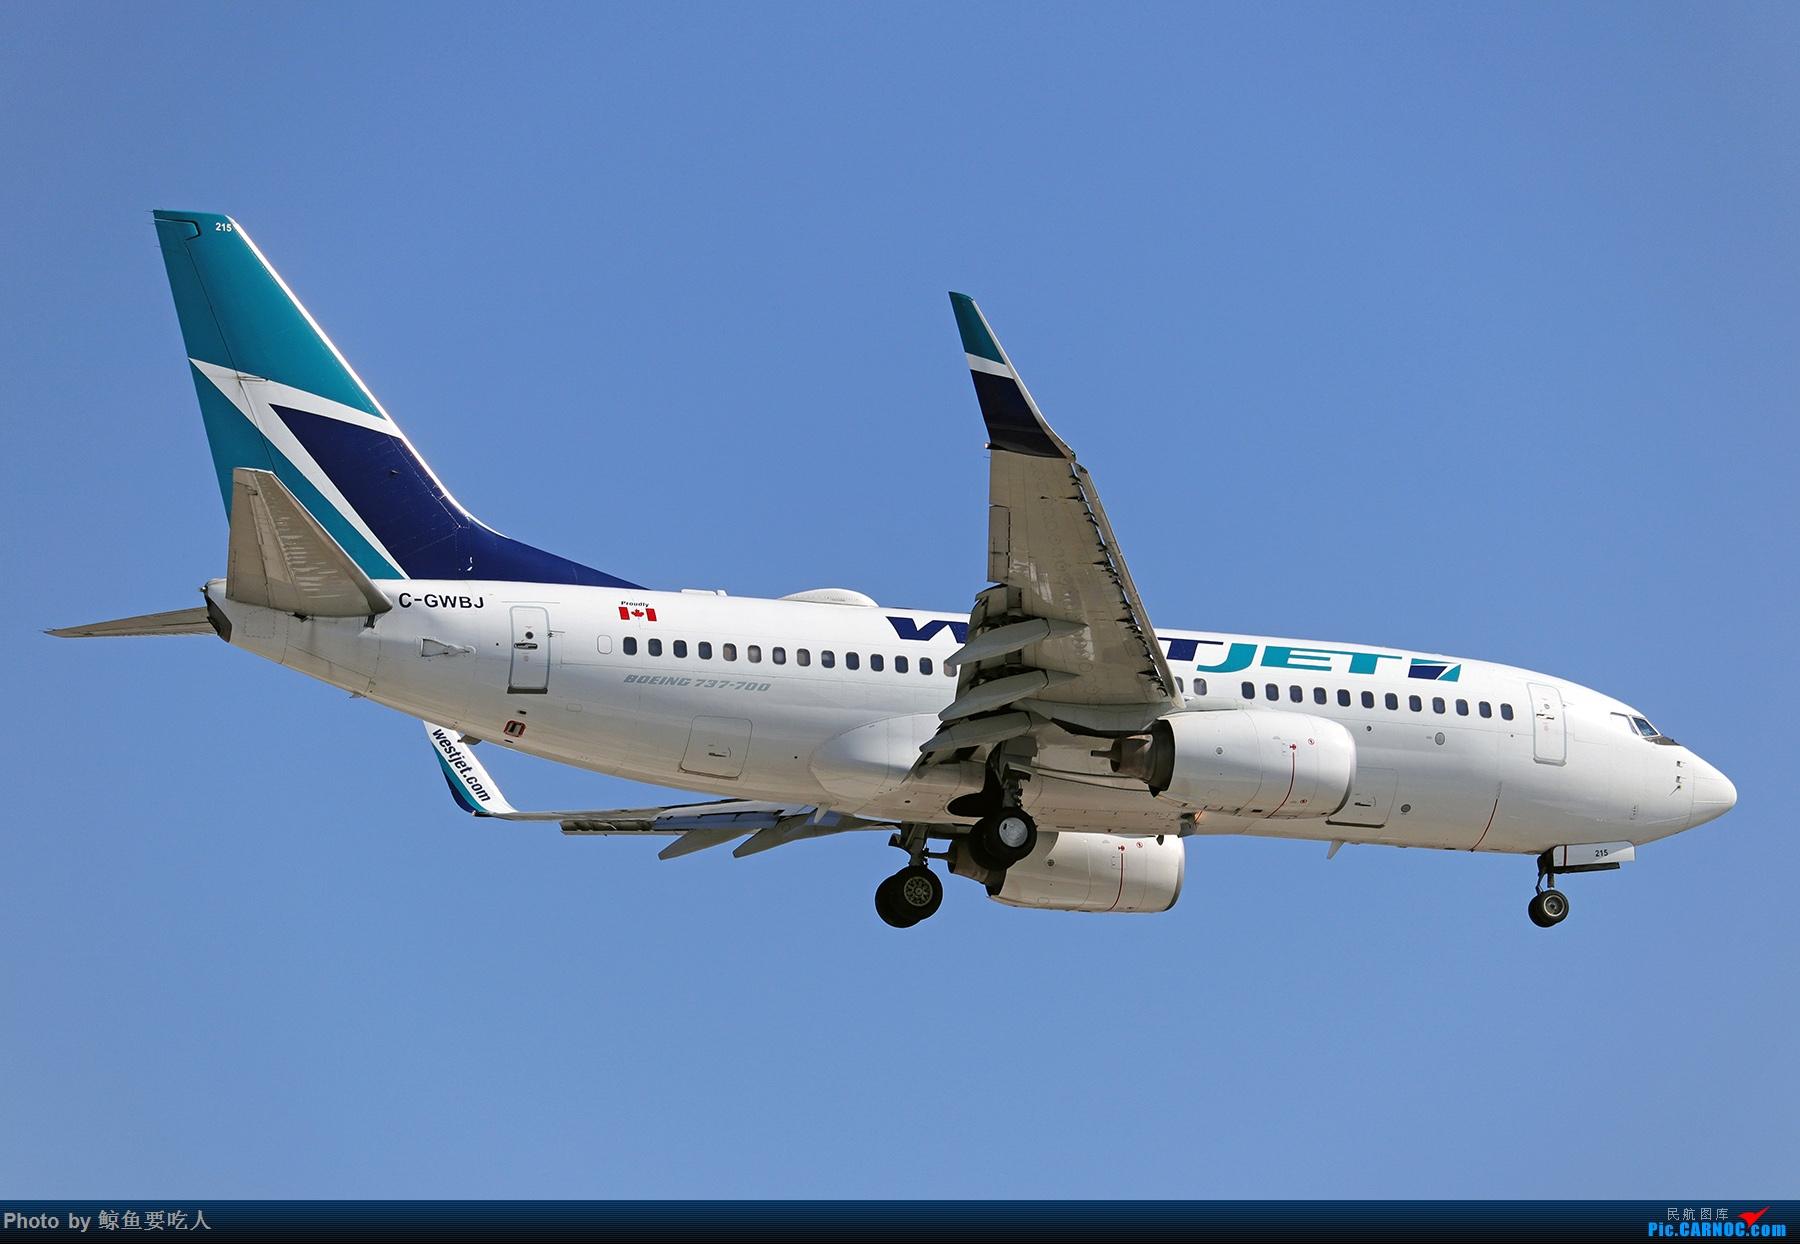 Re:[原创]【多图党】见证疫情后逐步的恢复,加拿大夏日多伦多皮尔逊机场拍机~ 乐见诸航空公司复航多伦多 BOEING 737-700 C-GWBJ 多伦多皮尔逊国际机场